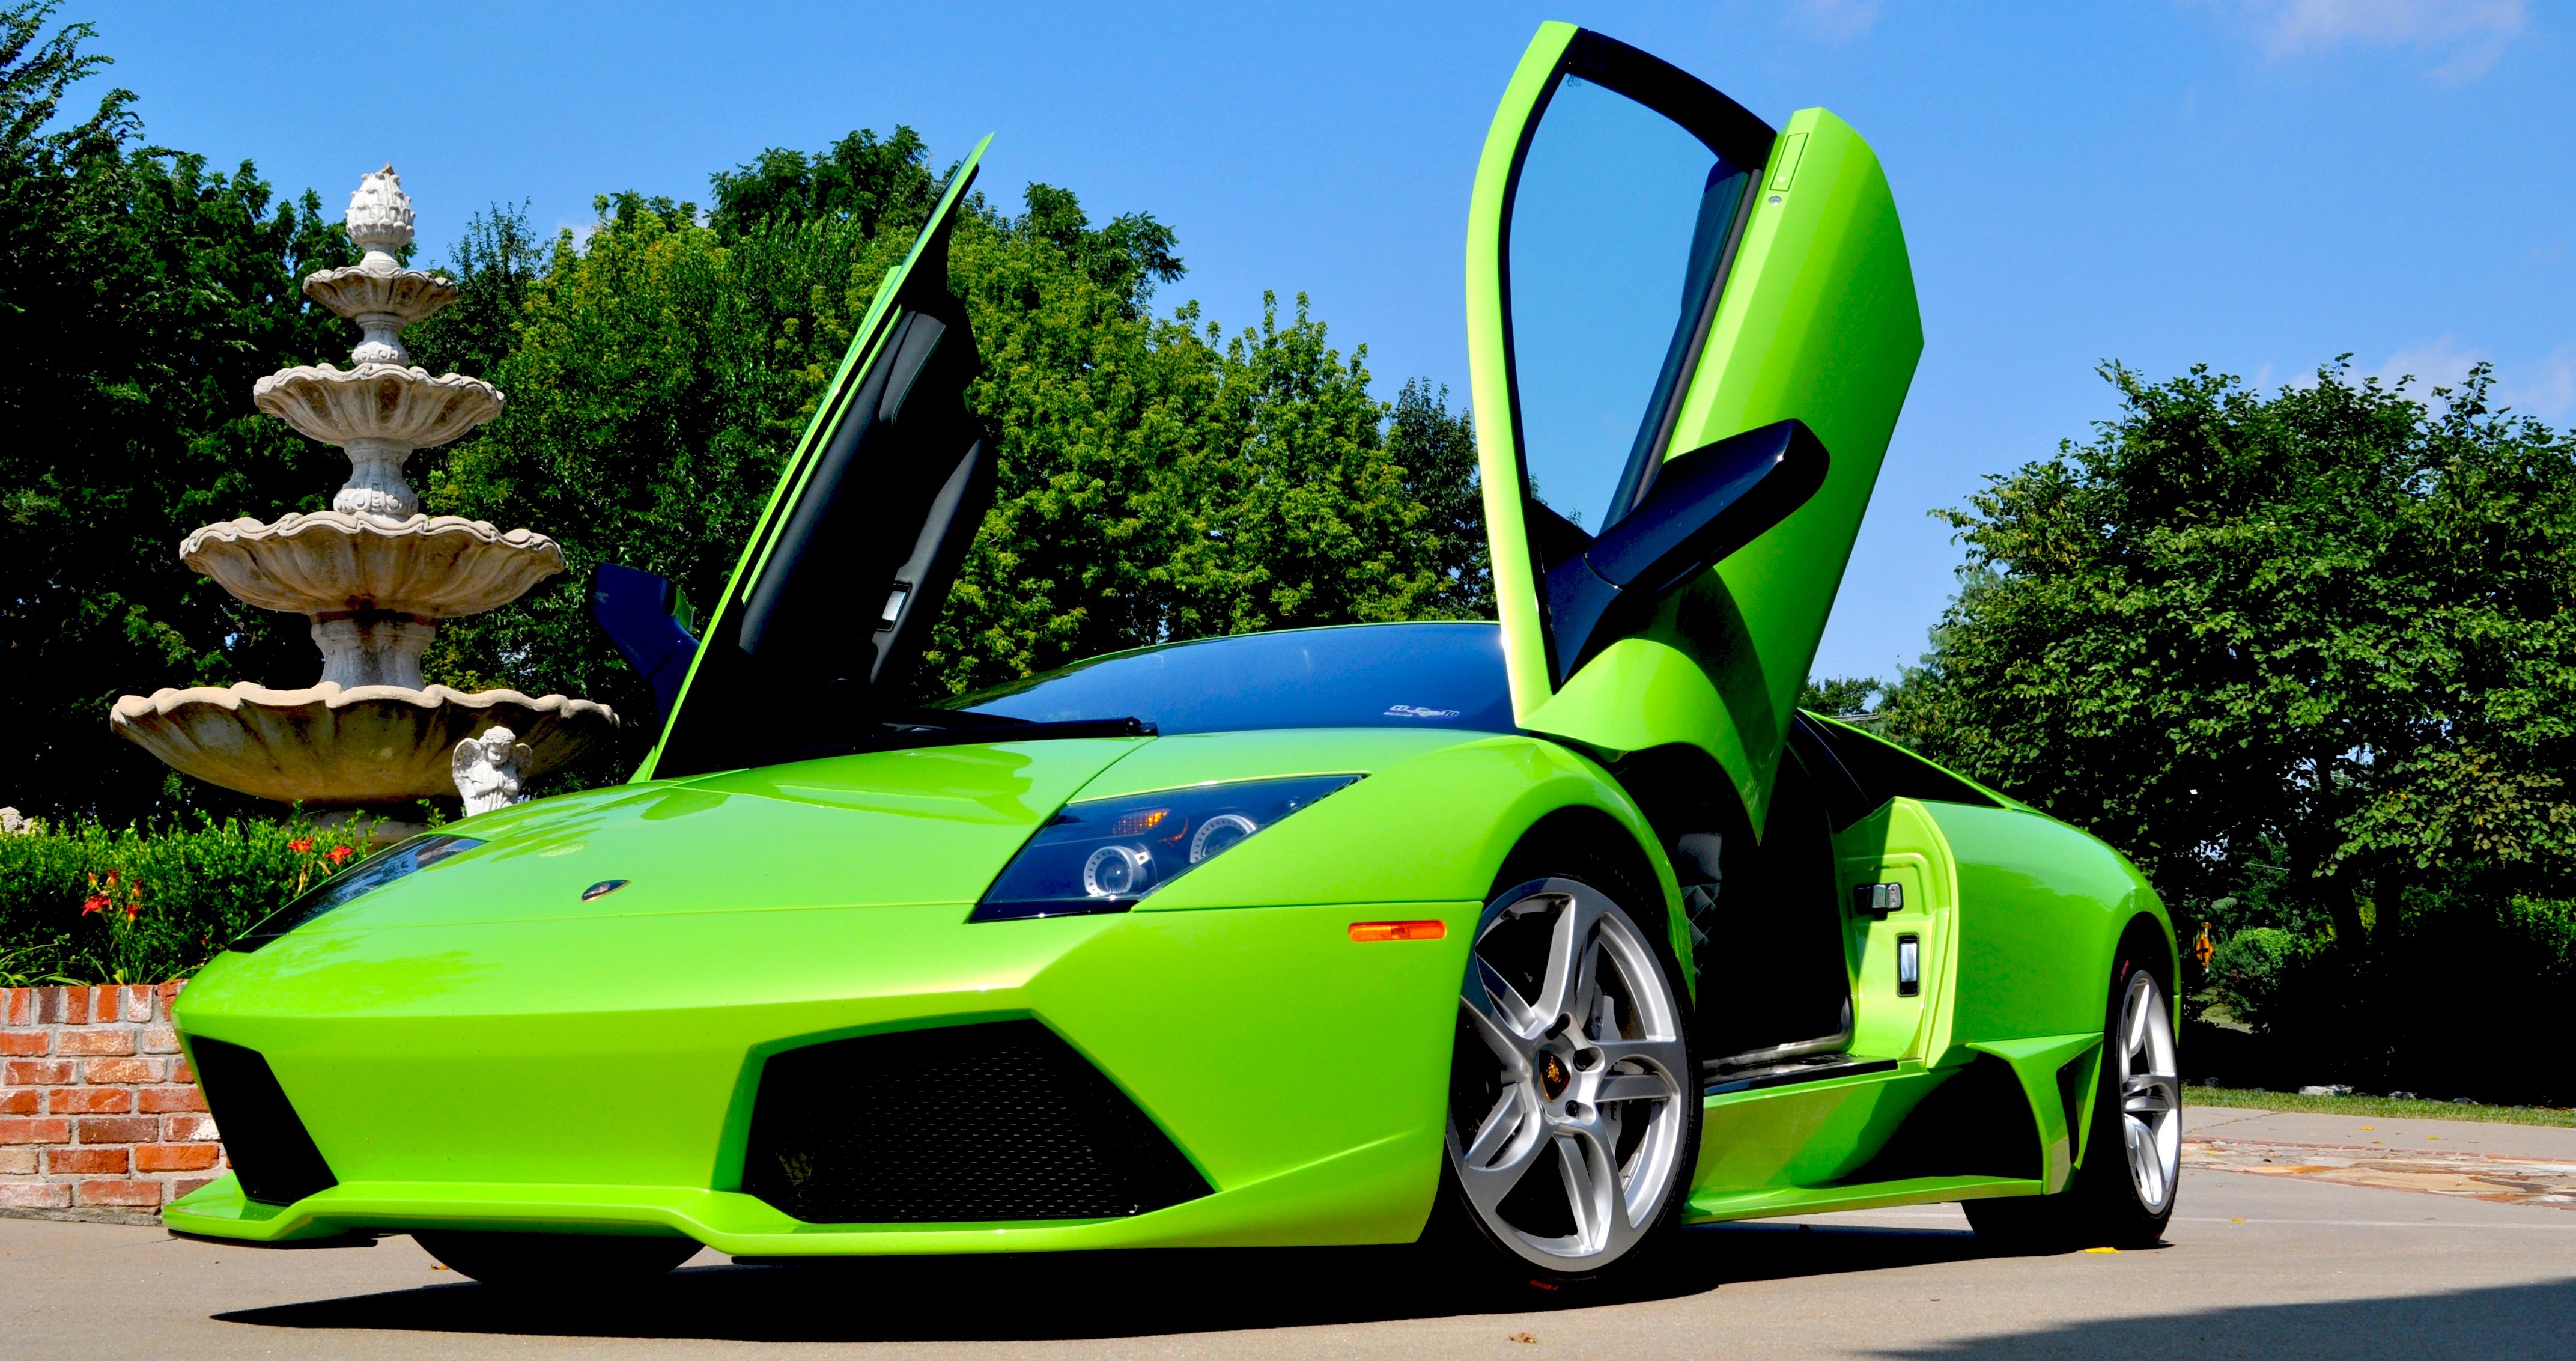 Lamborghini Murcielago LP640 – włoski demon szybkości